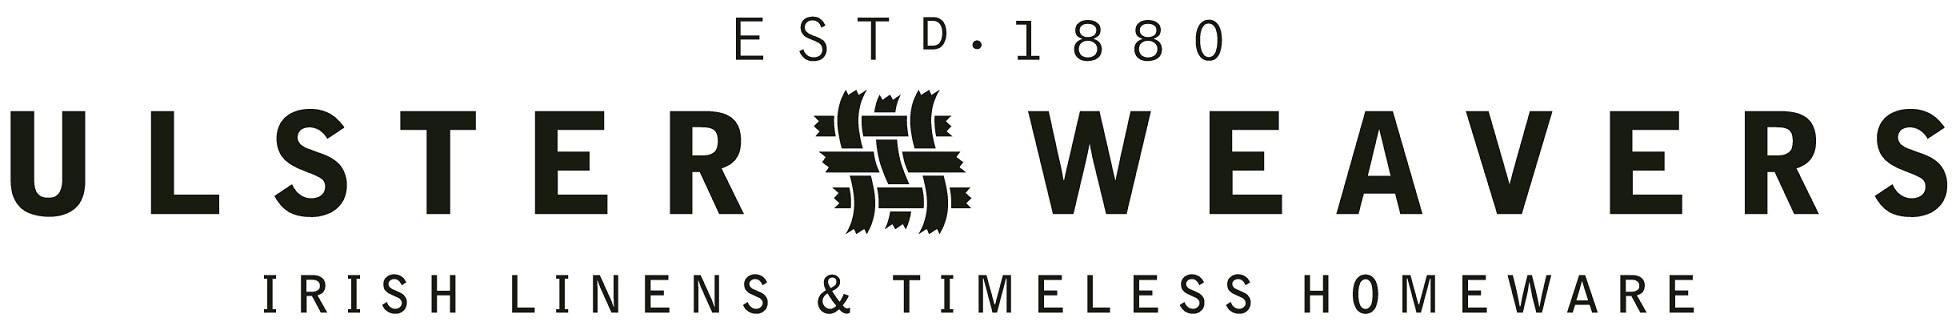 Ulster_Weavers_MASTER_BRAND_logo (cmyk)_AW (002)